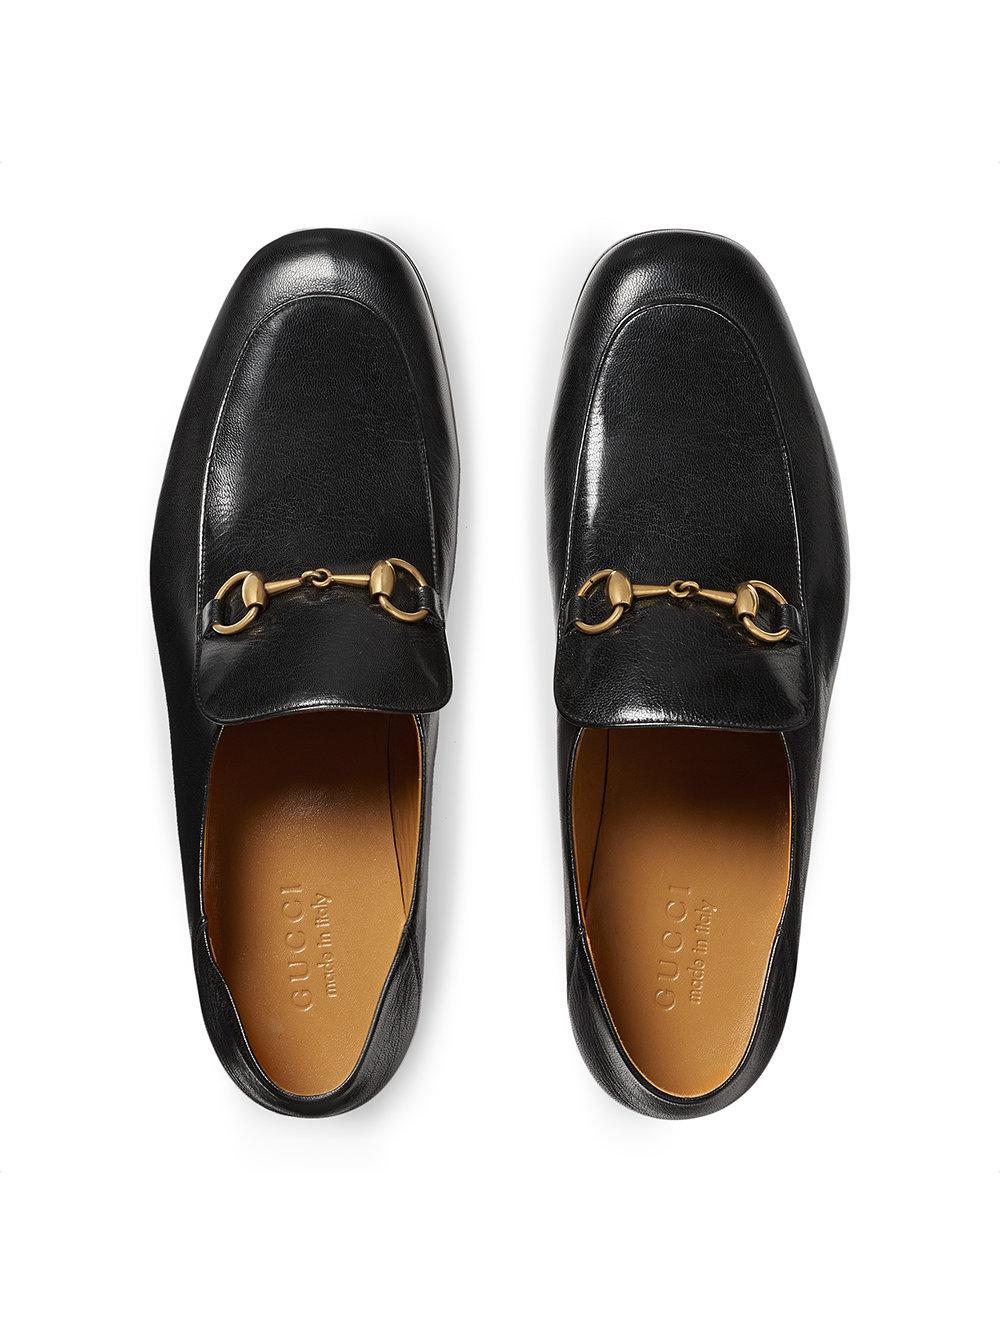 d5a9bac3c Gucci - Black Leather Horsebit Loafer for Men - Lyst. View fullscreen